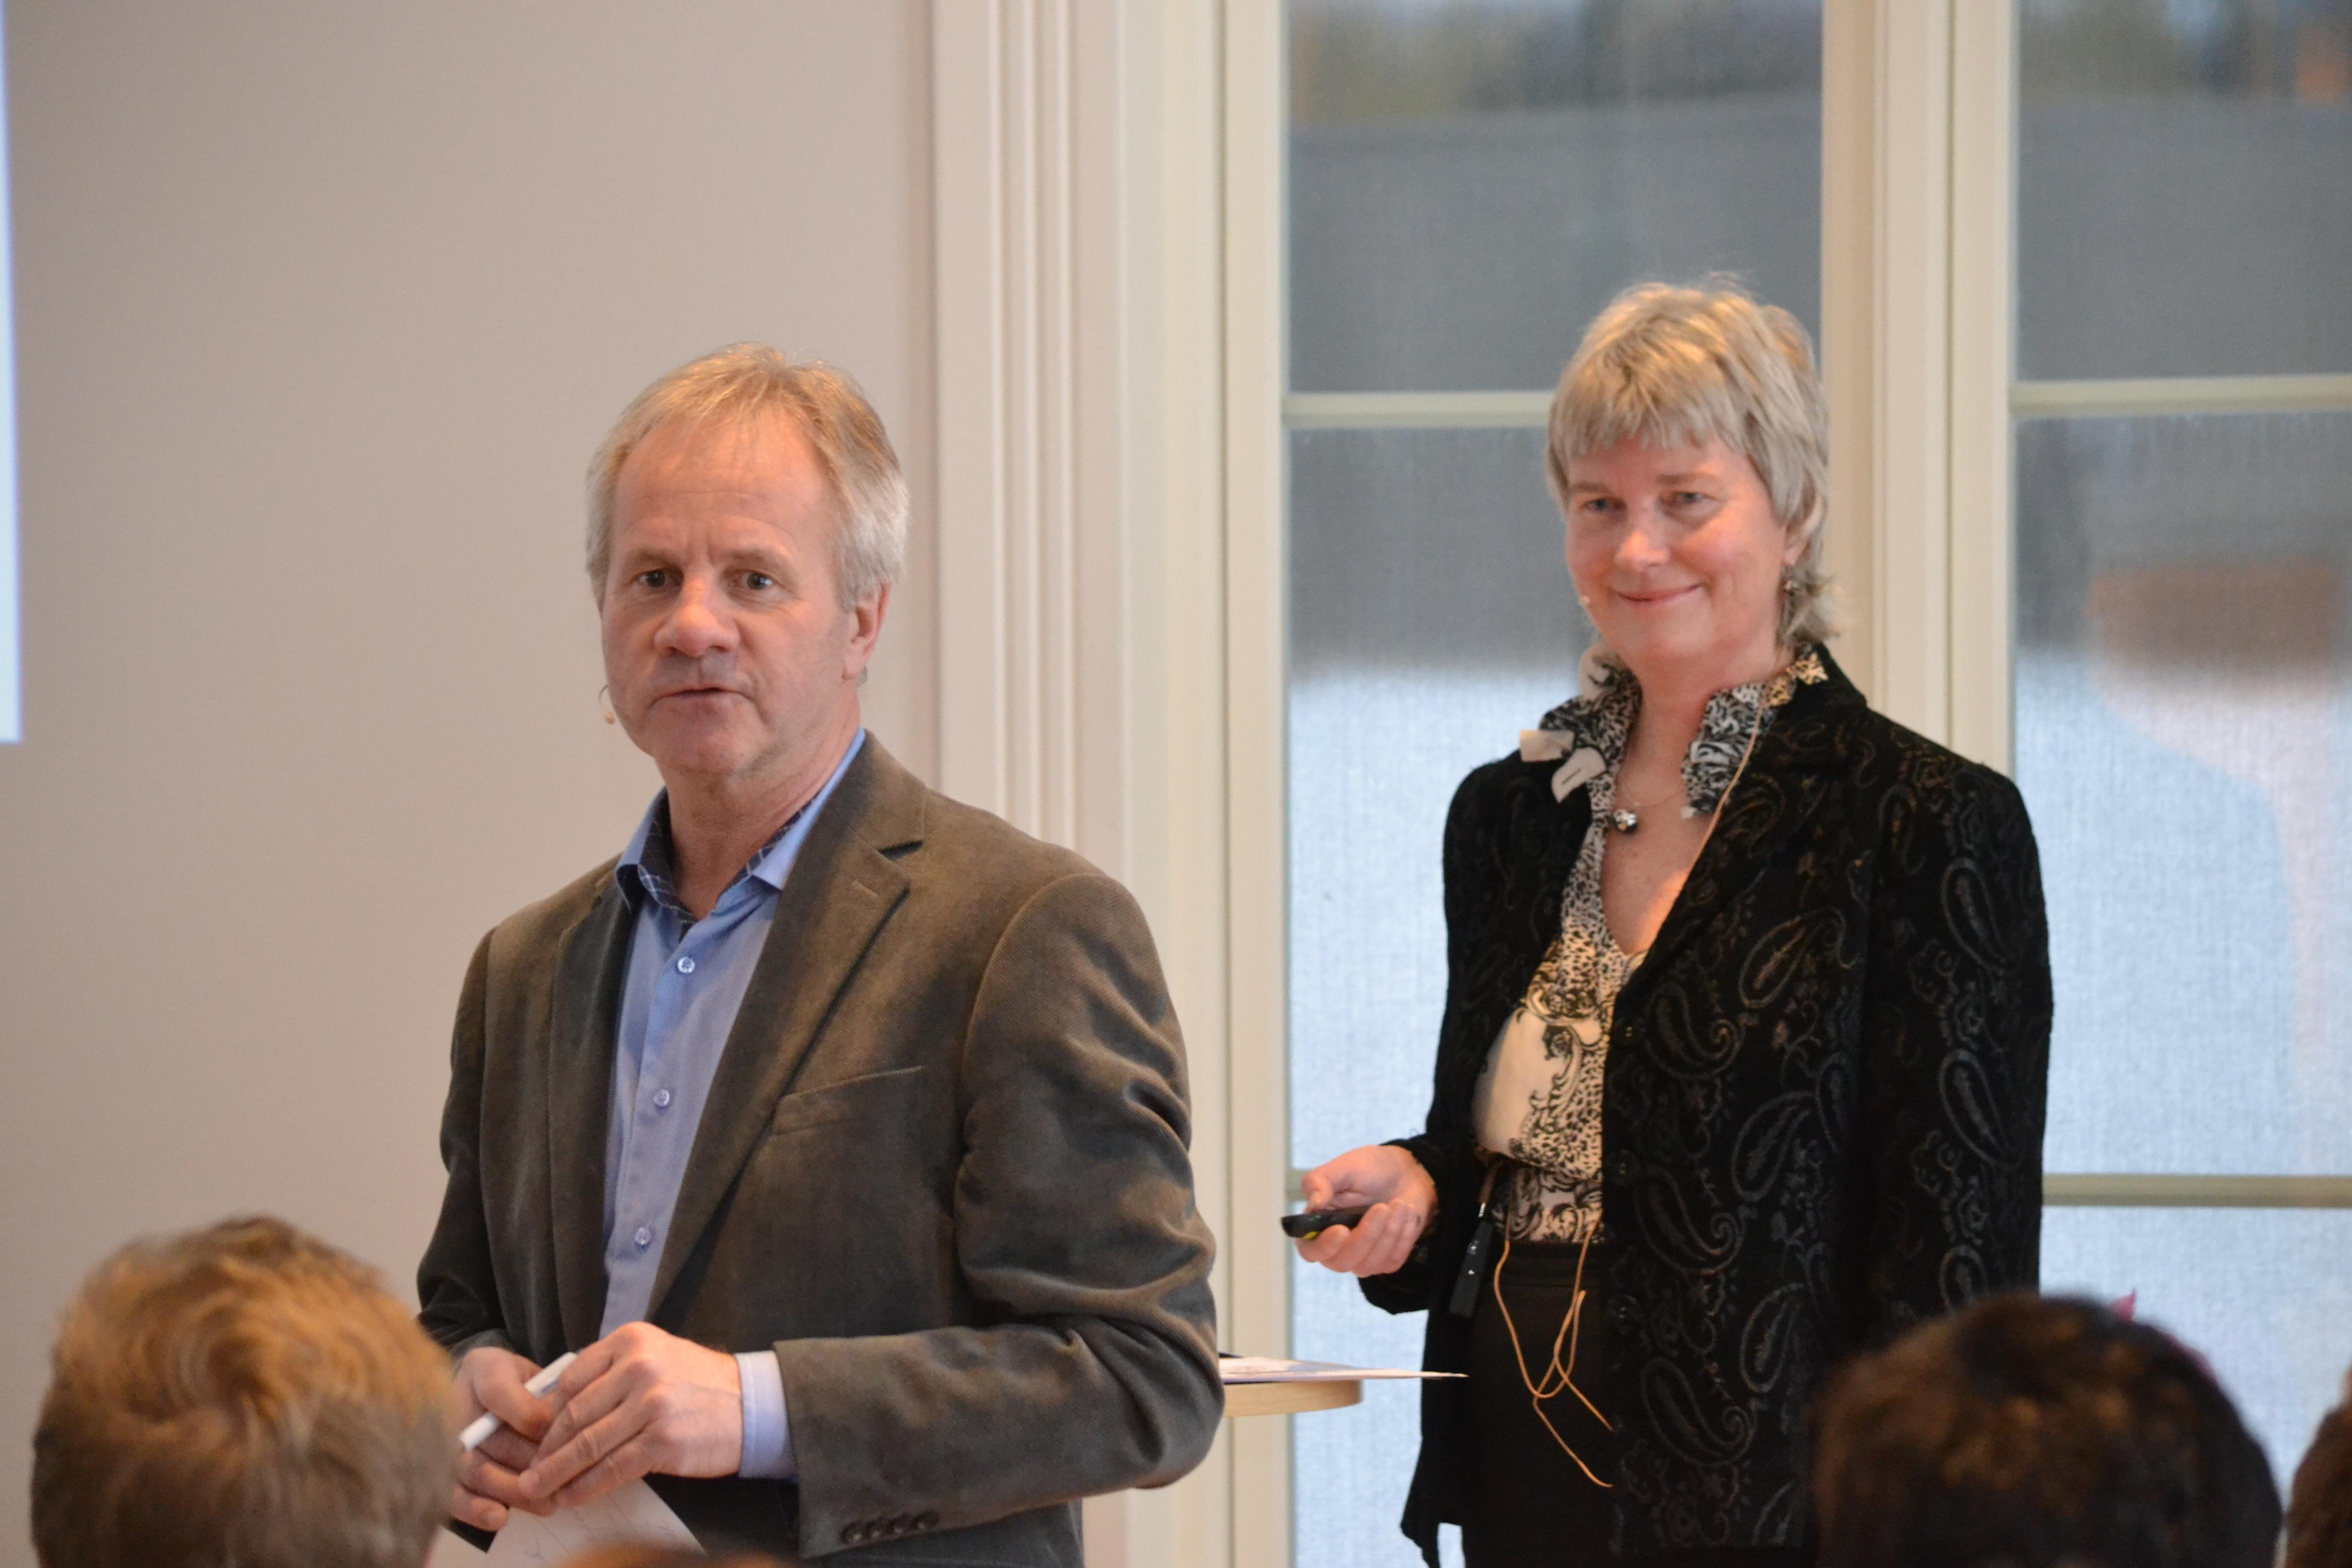 folkehelse Egil Halleland og Hilde Øverby.jpg